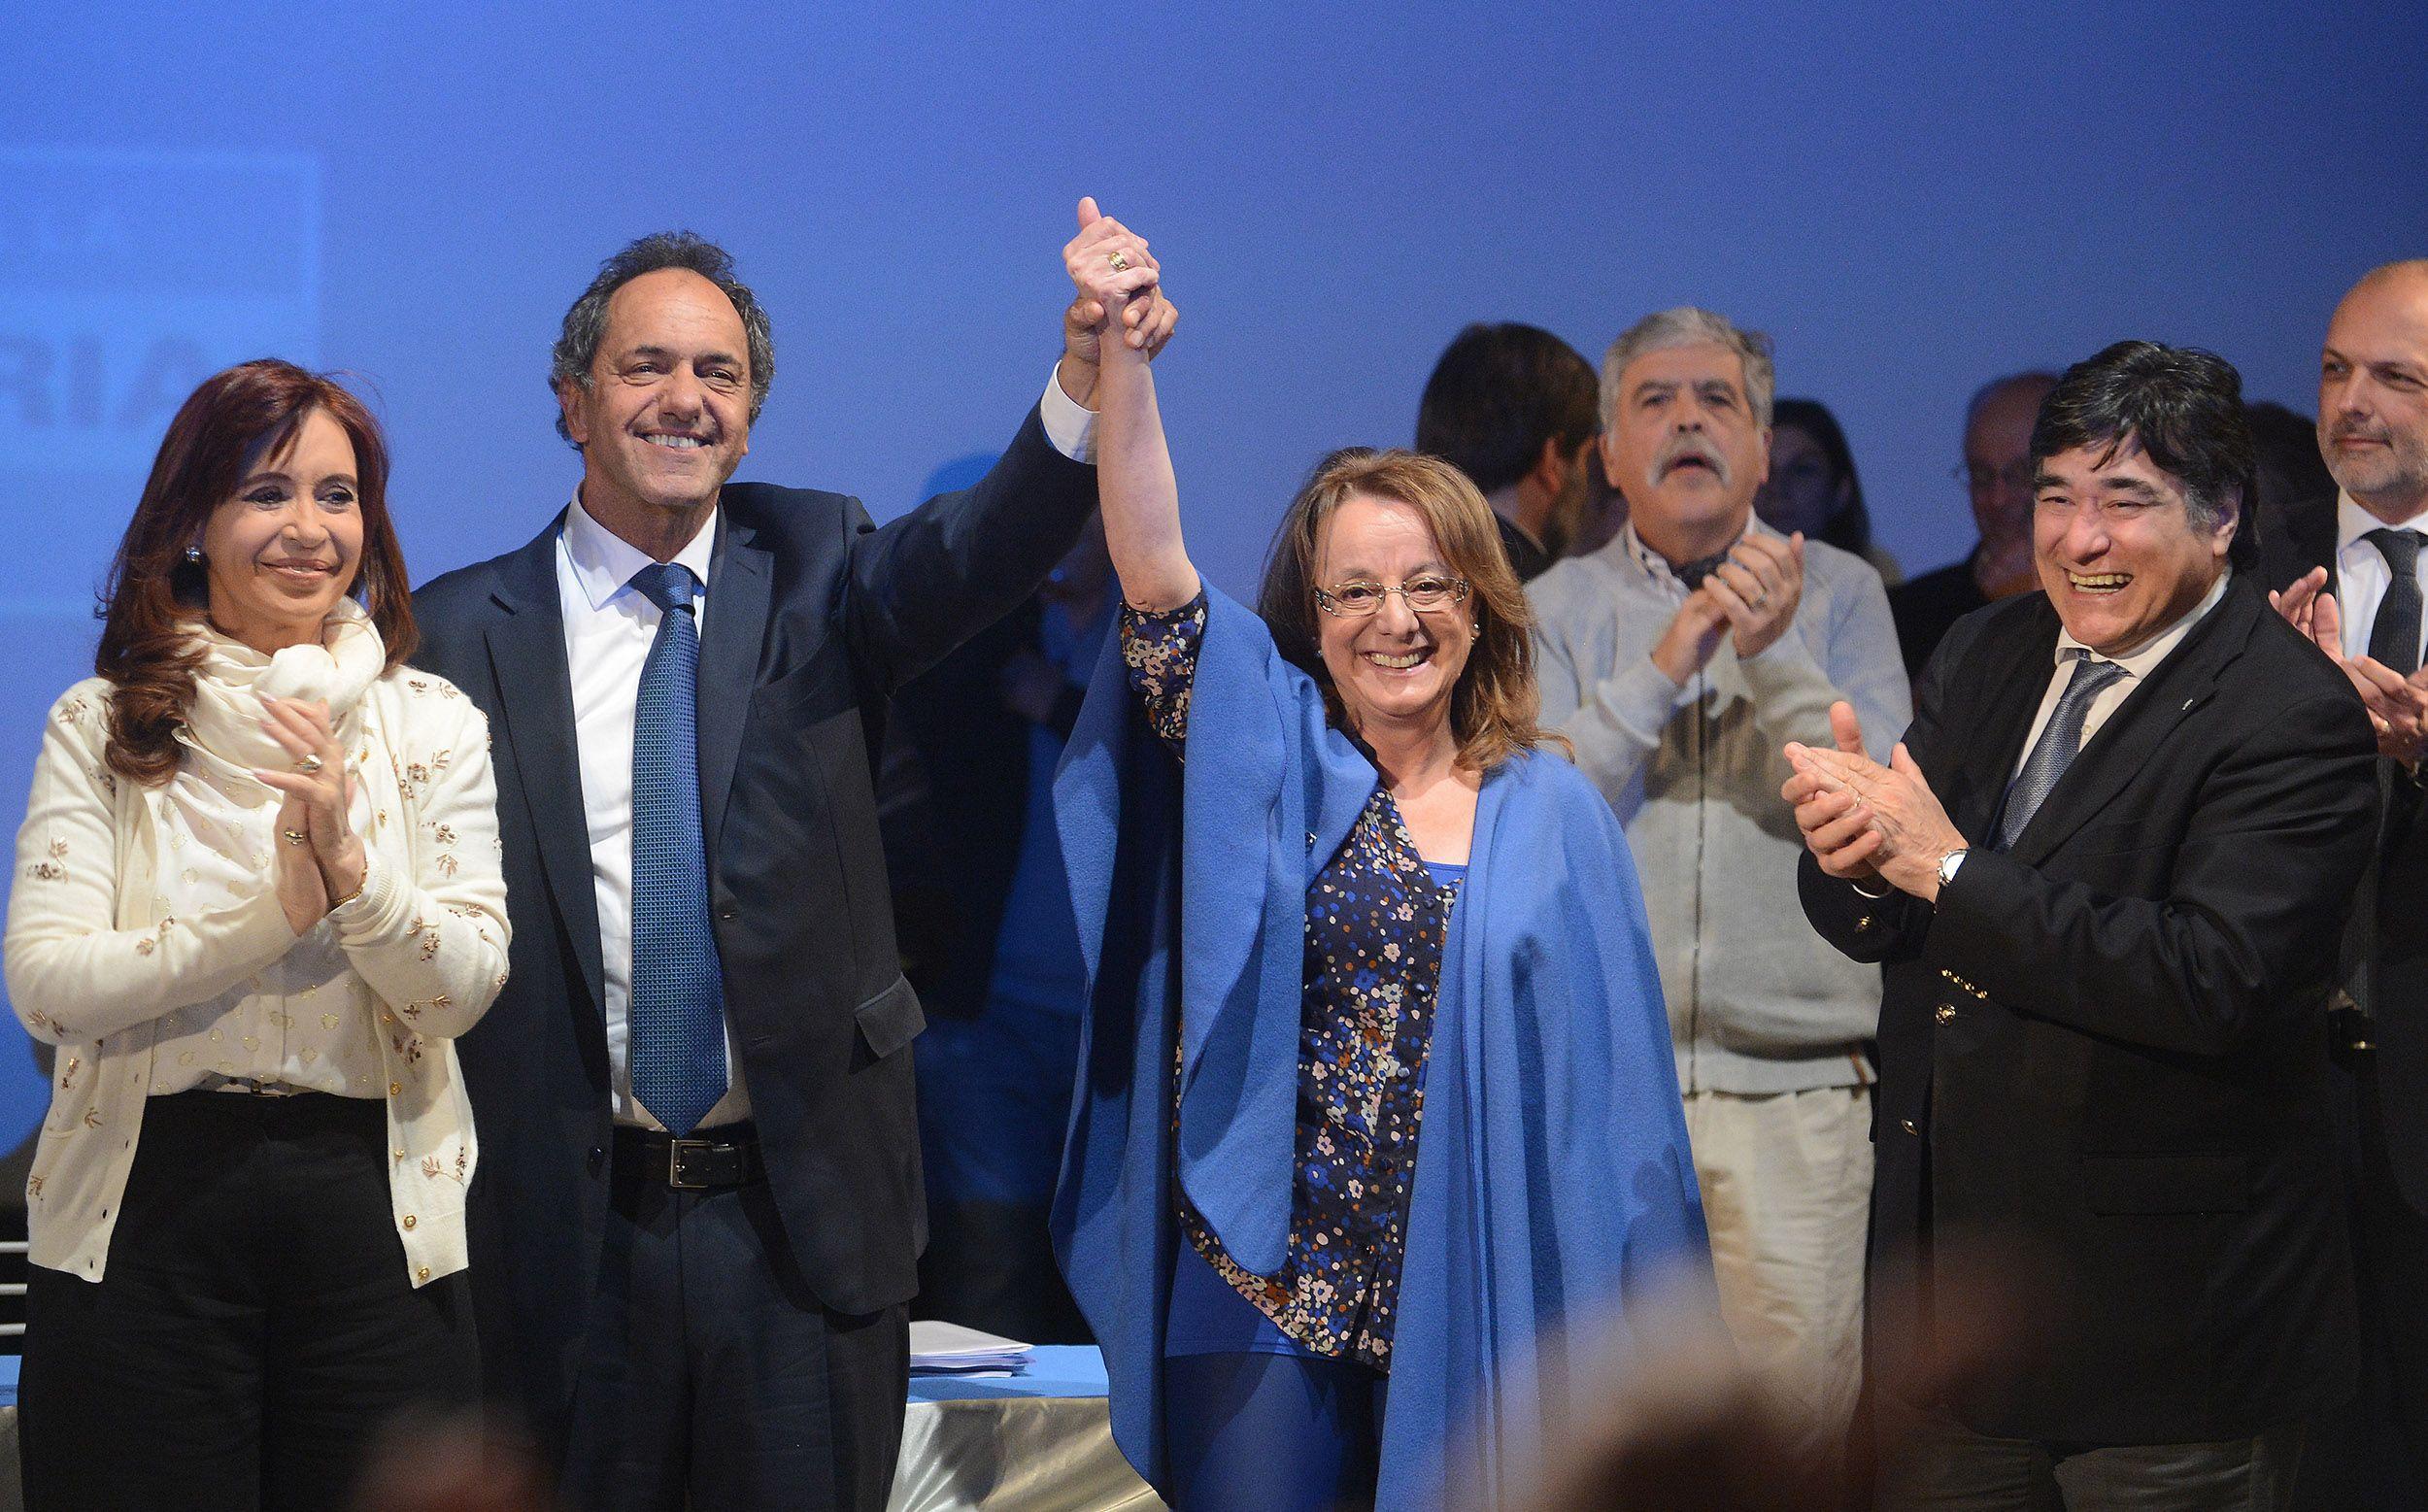 Cristina Kirchner: Daniel va a ser el presidente de todos y va a continuar con esta obra